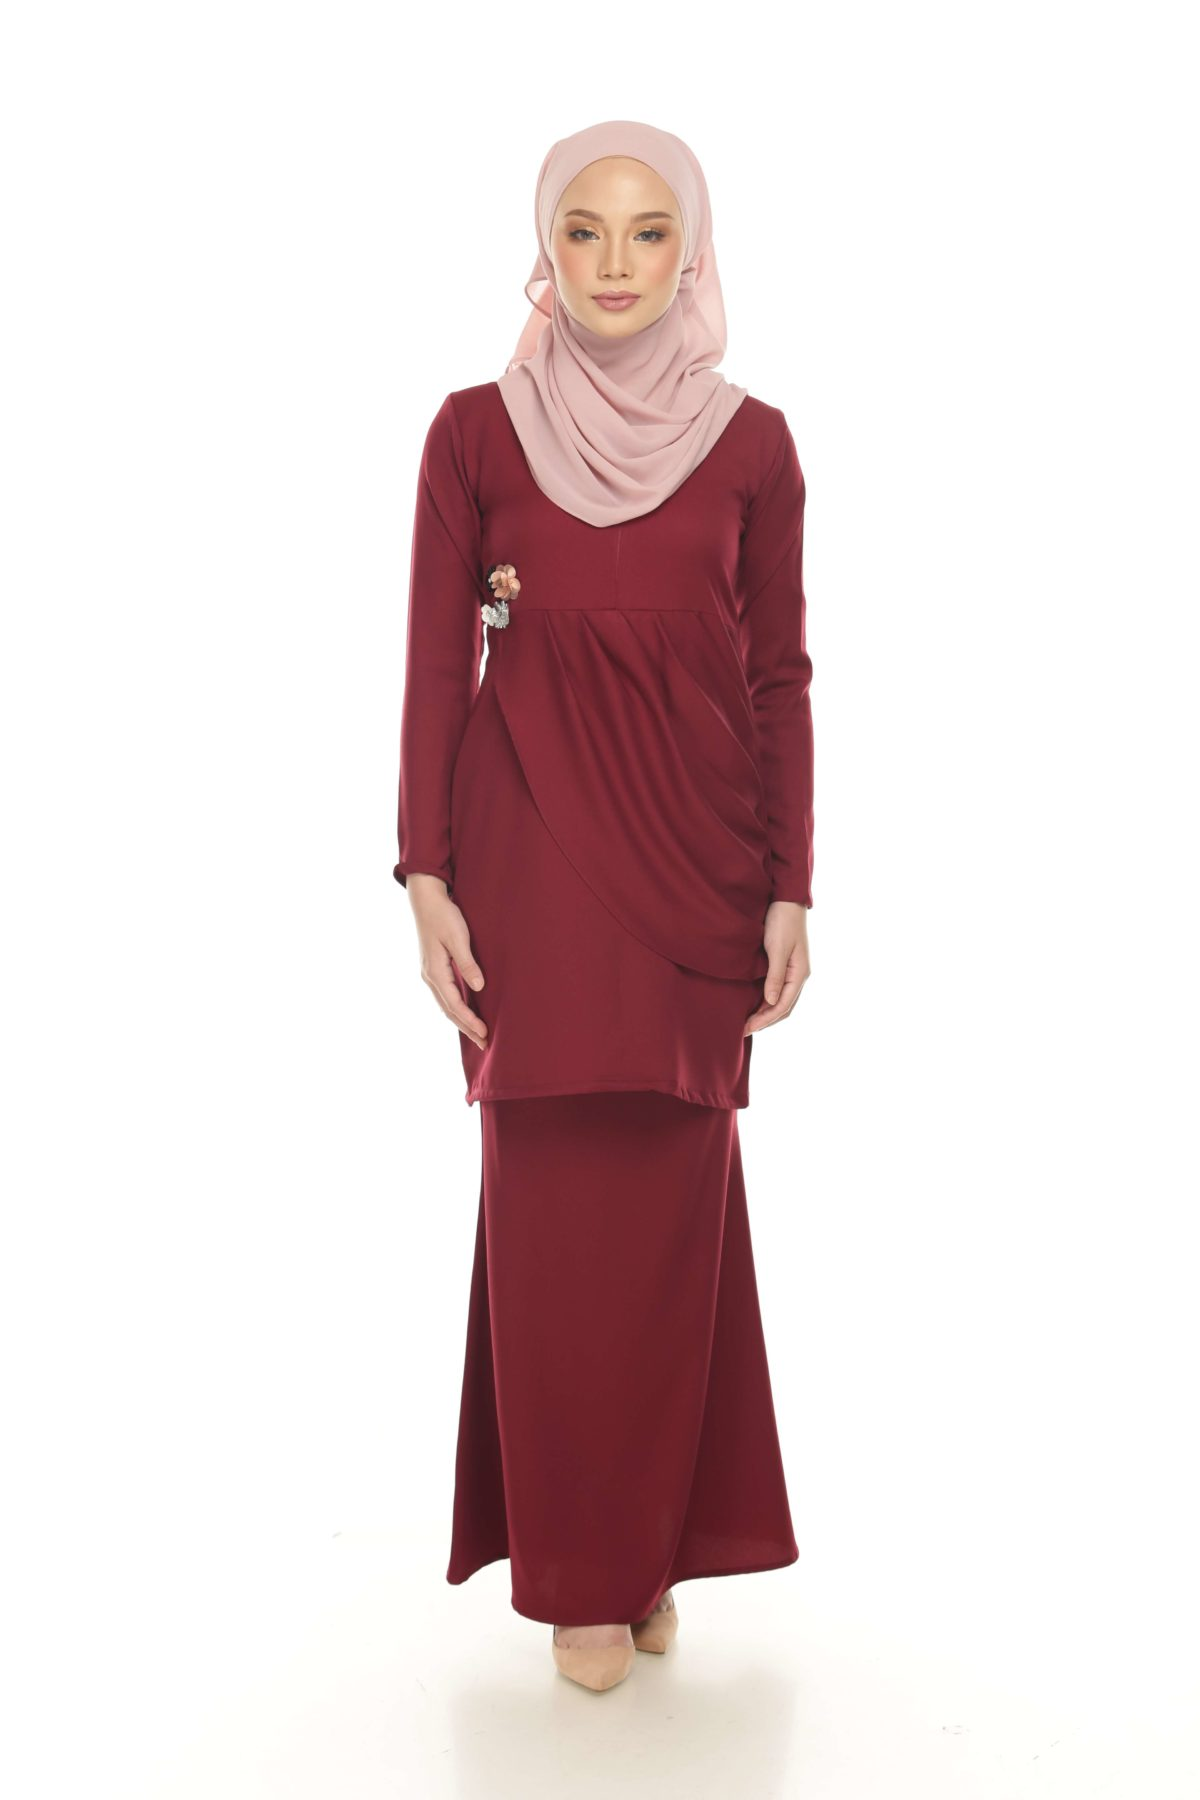 Nirmala Maroon Cranberry